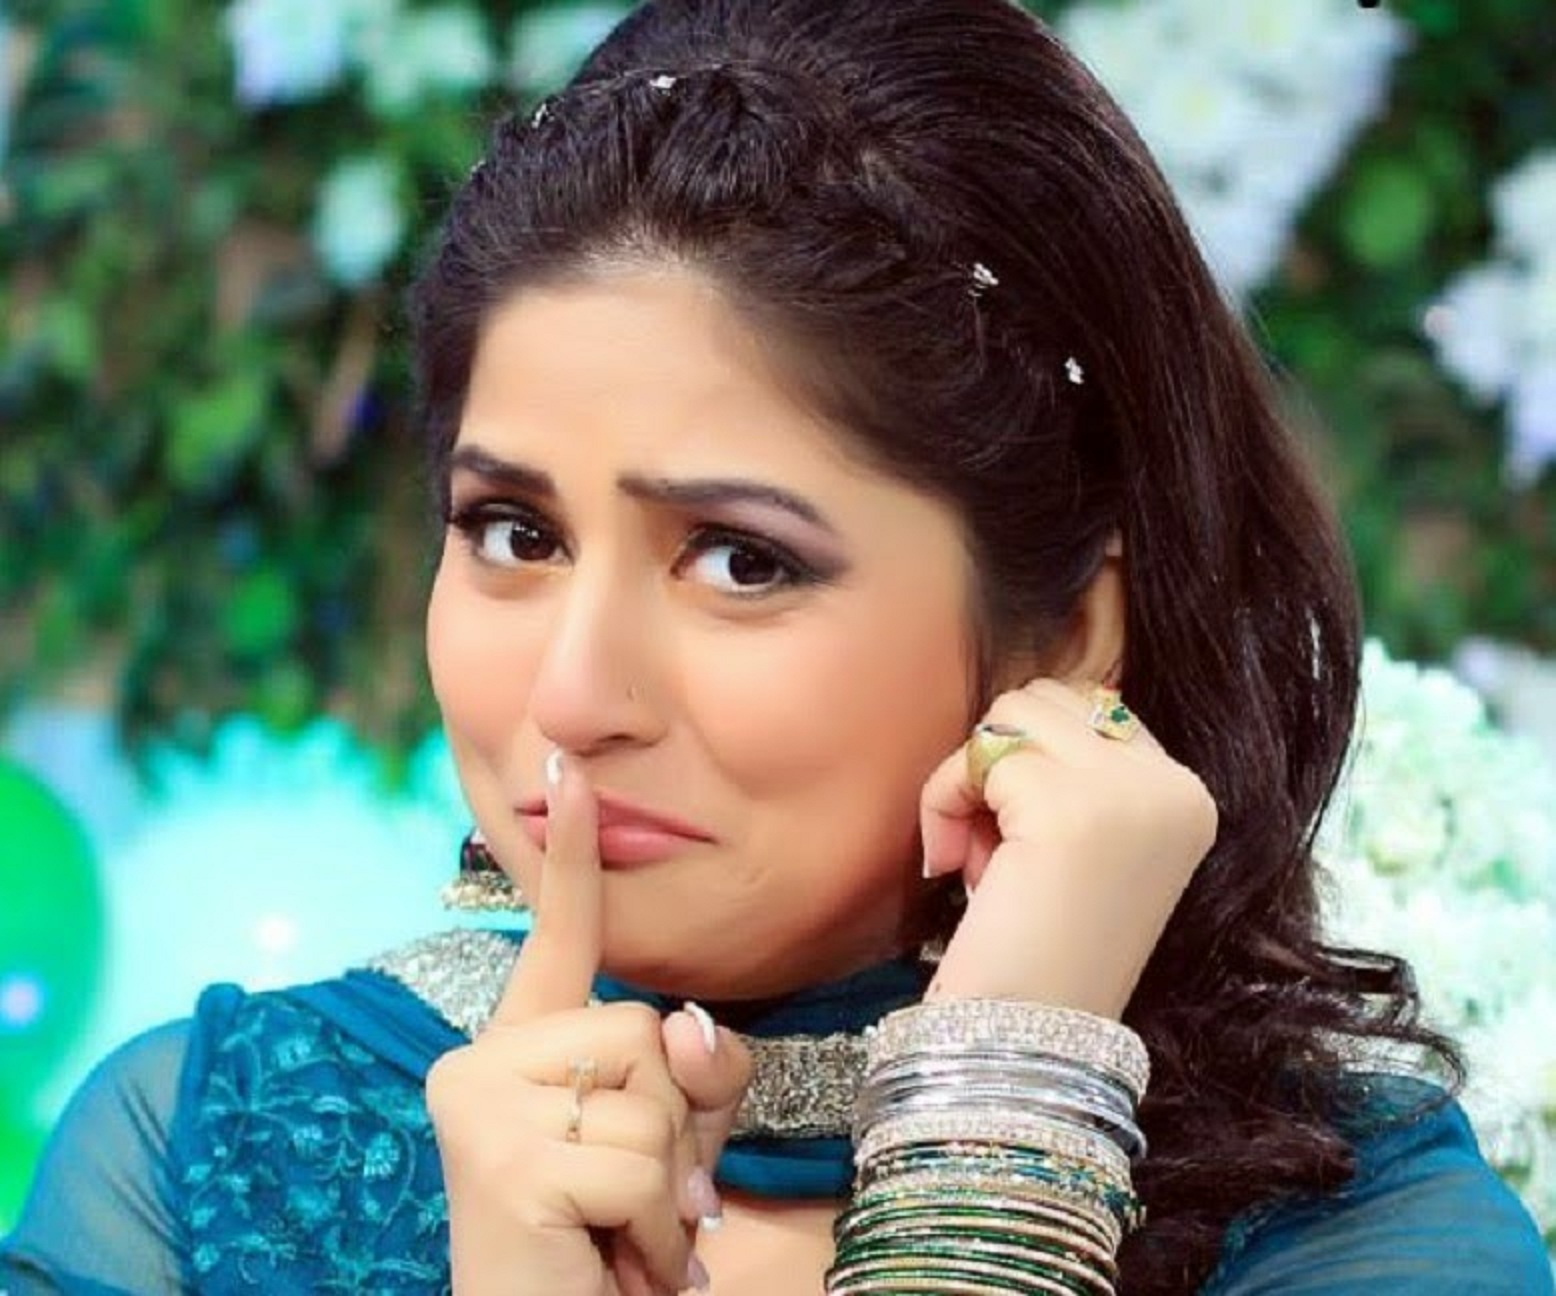 Cute Stylish Girl Wallpaper Hd Sanam Baloch Images Hd Wallpaper All 4u Wallpaper